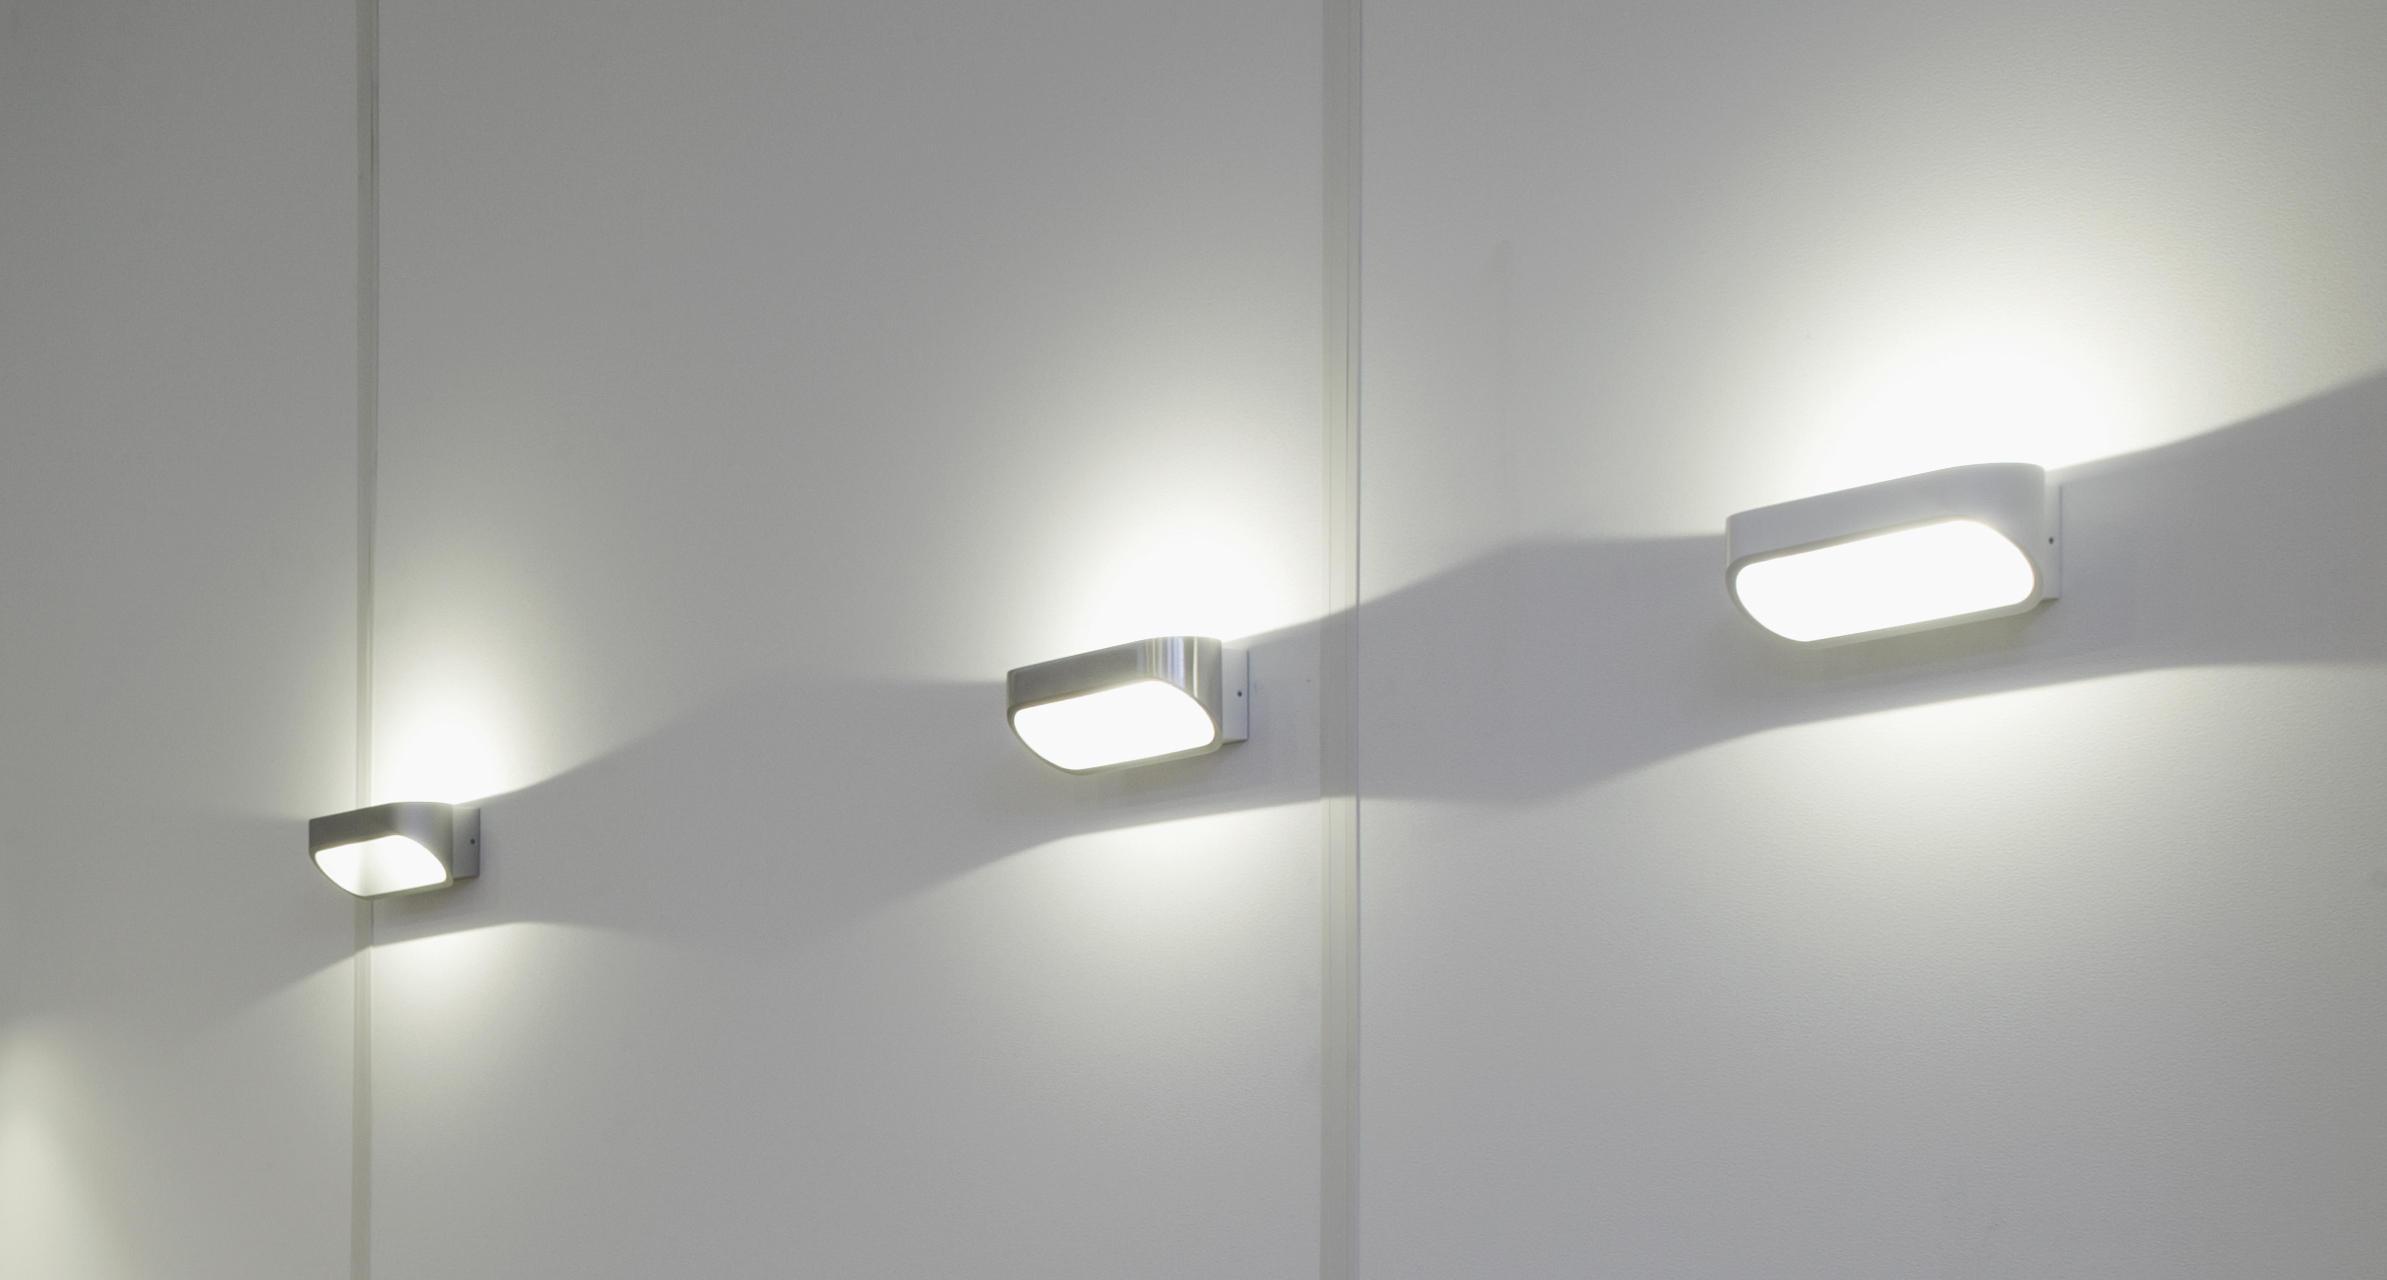 bo led wandleuchte allgemeinbeleuchtung von unex architonic. Black Bedroom Furniture Sets. Home Design Ideas